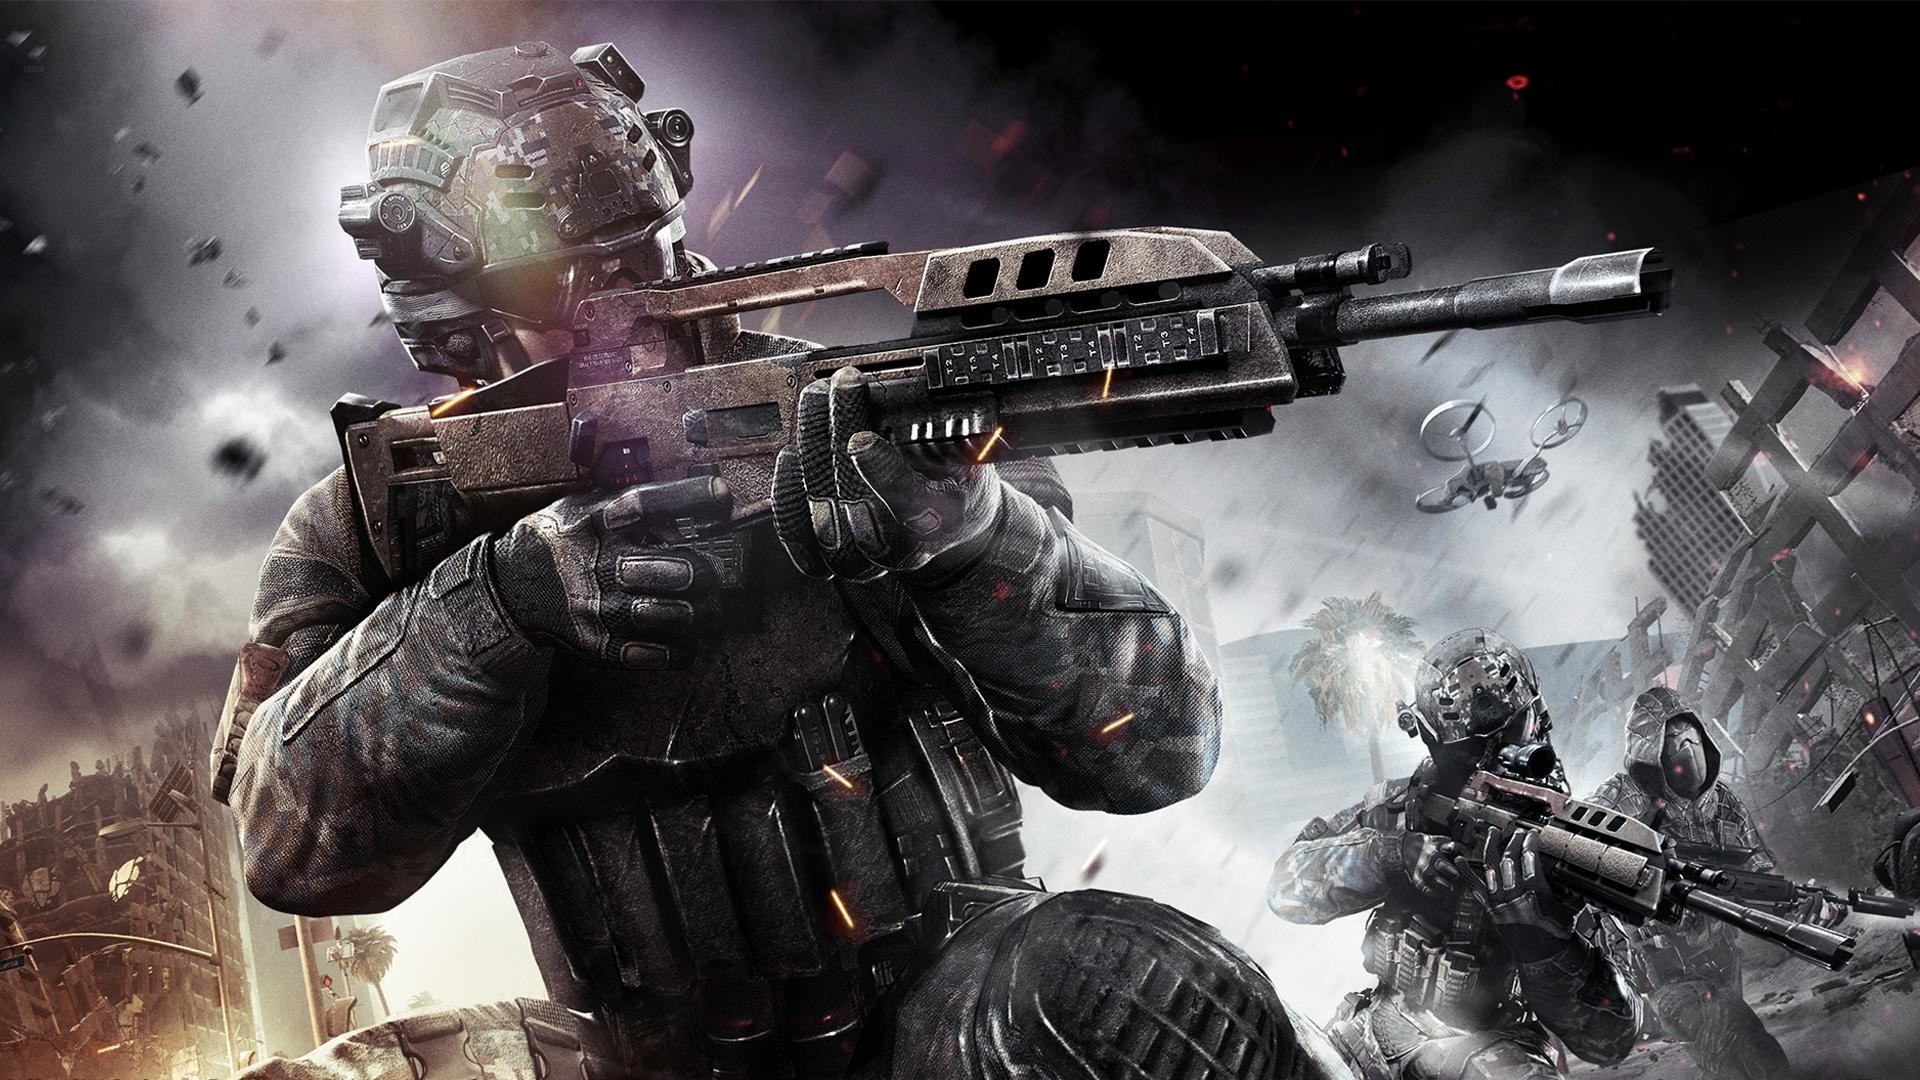 Download Black Ops 2 Video Game wallpaper 1080p hd wallpaper .